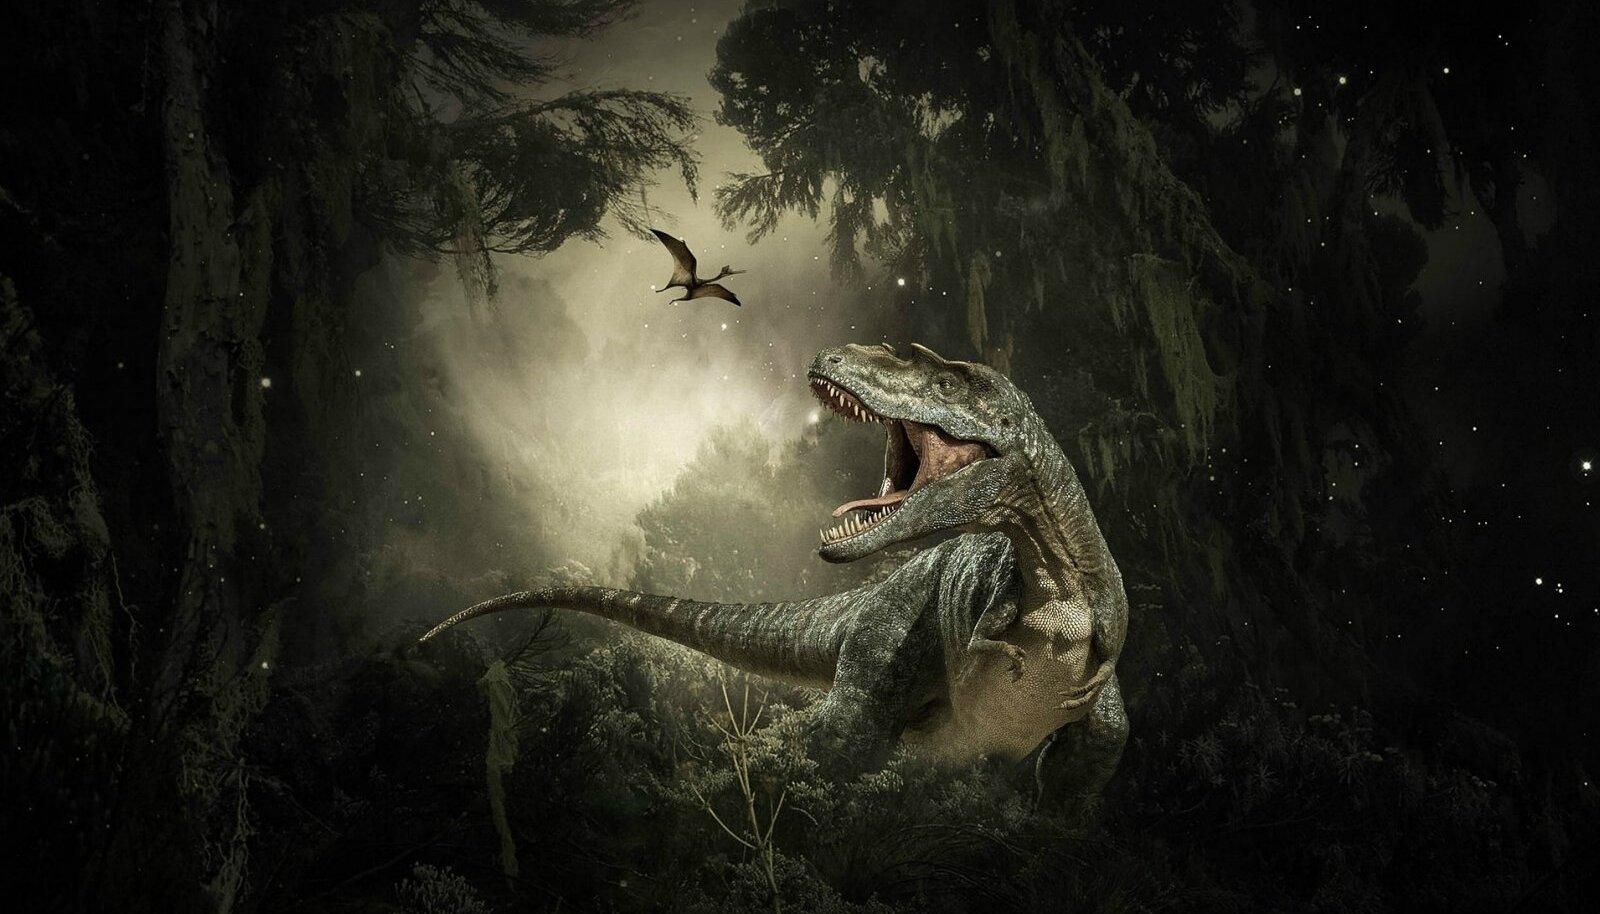 T. rex kunstniku nägemuses (Foto: Pixabay / Willgard Krause)